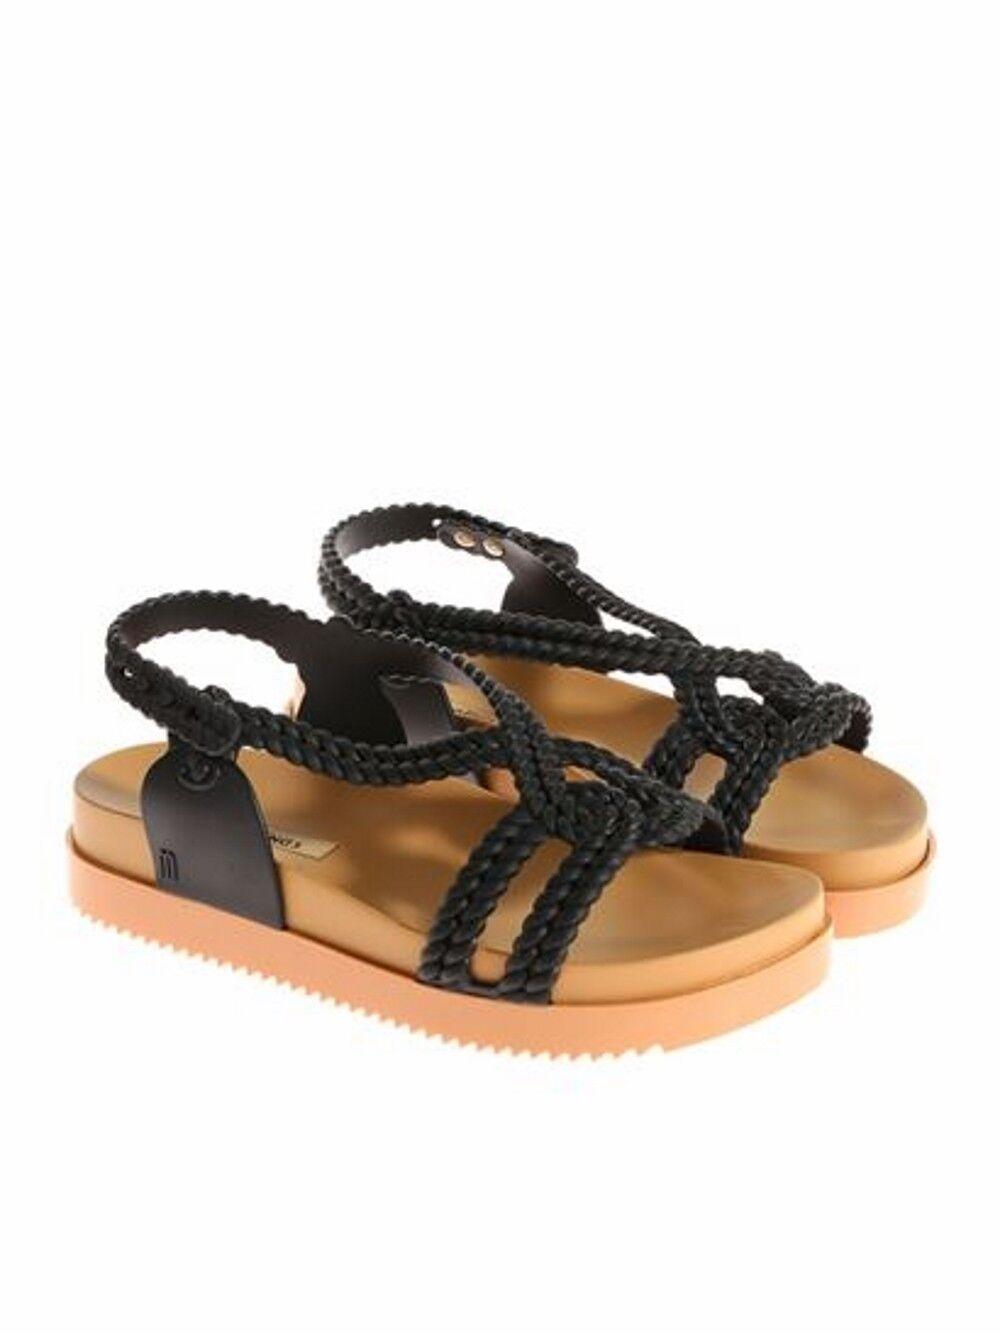 Melissa Sandalo cosmic + salinas, Cosmic + salinas sandals